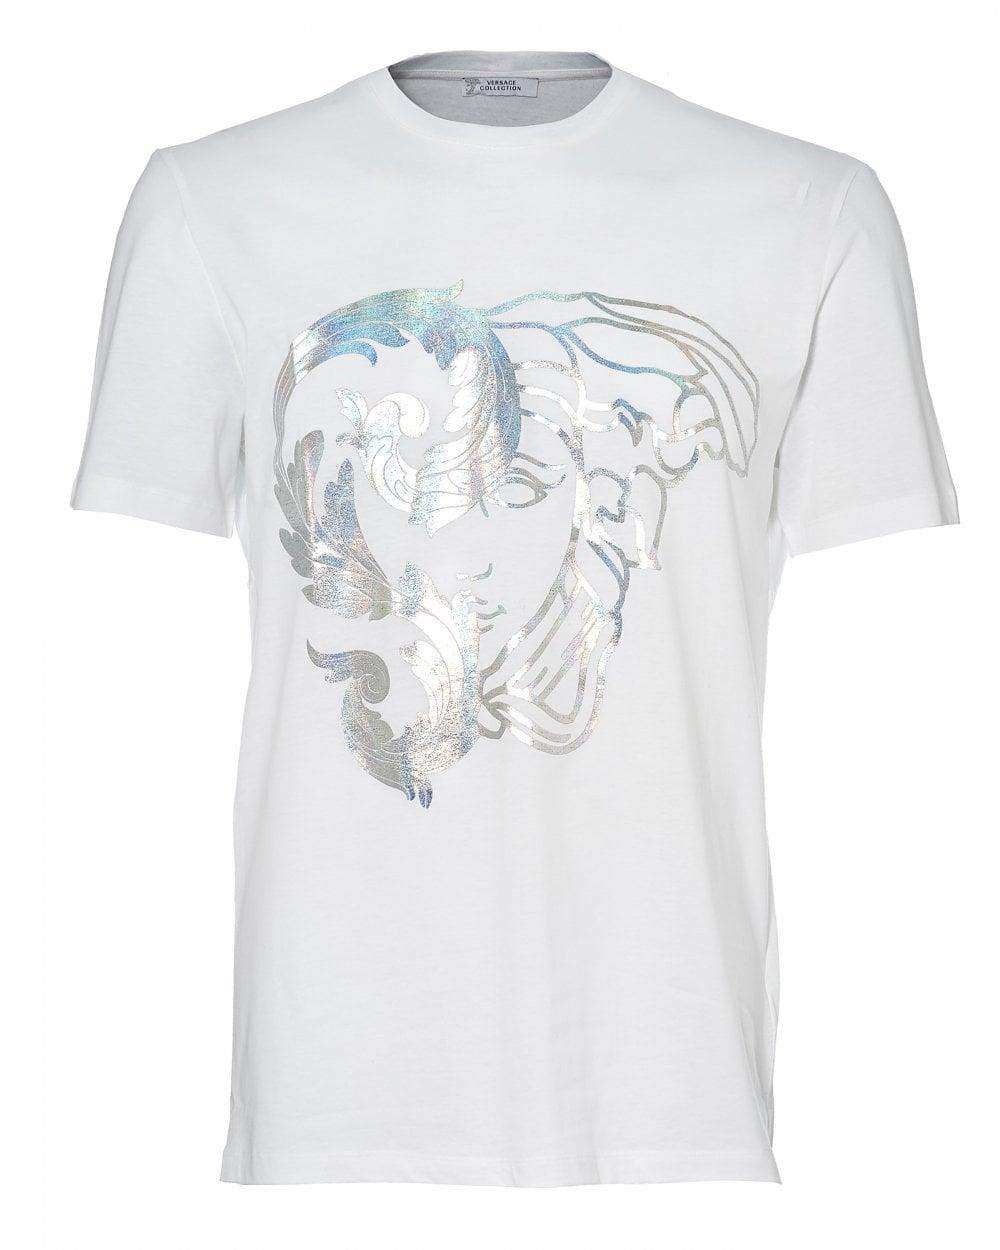 45261fdf Versace Collection Mens Foil Half Medusa T-Shirt, White Tee